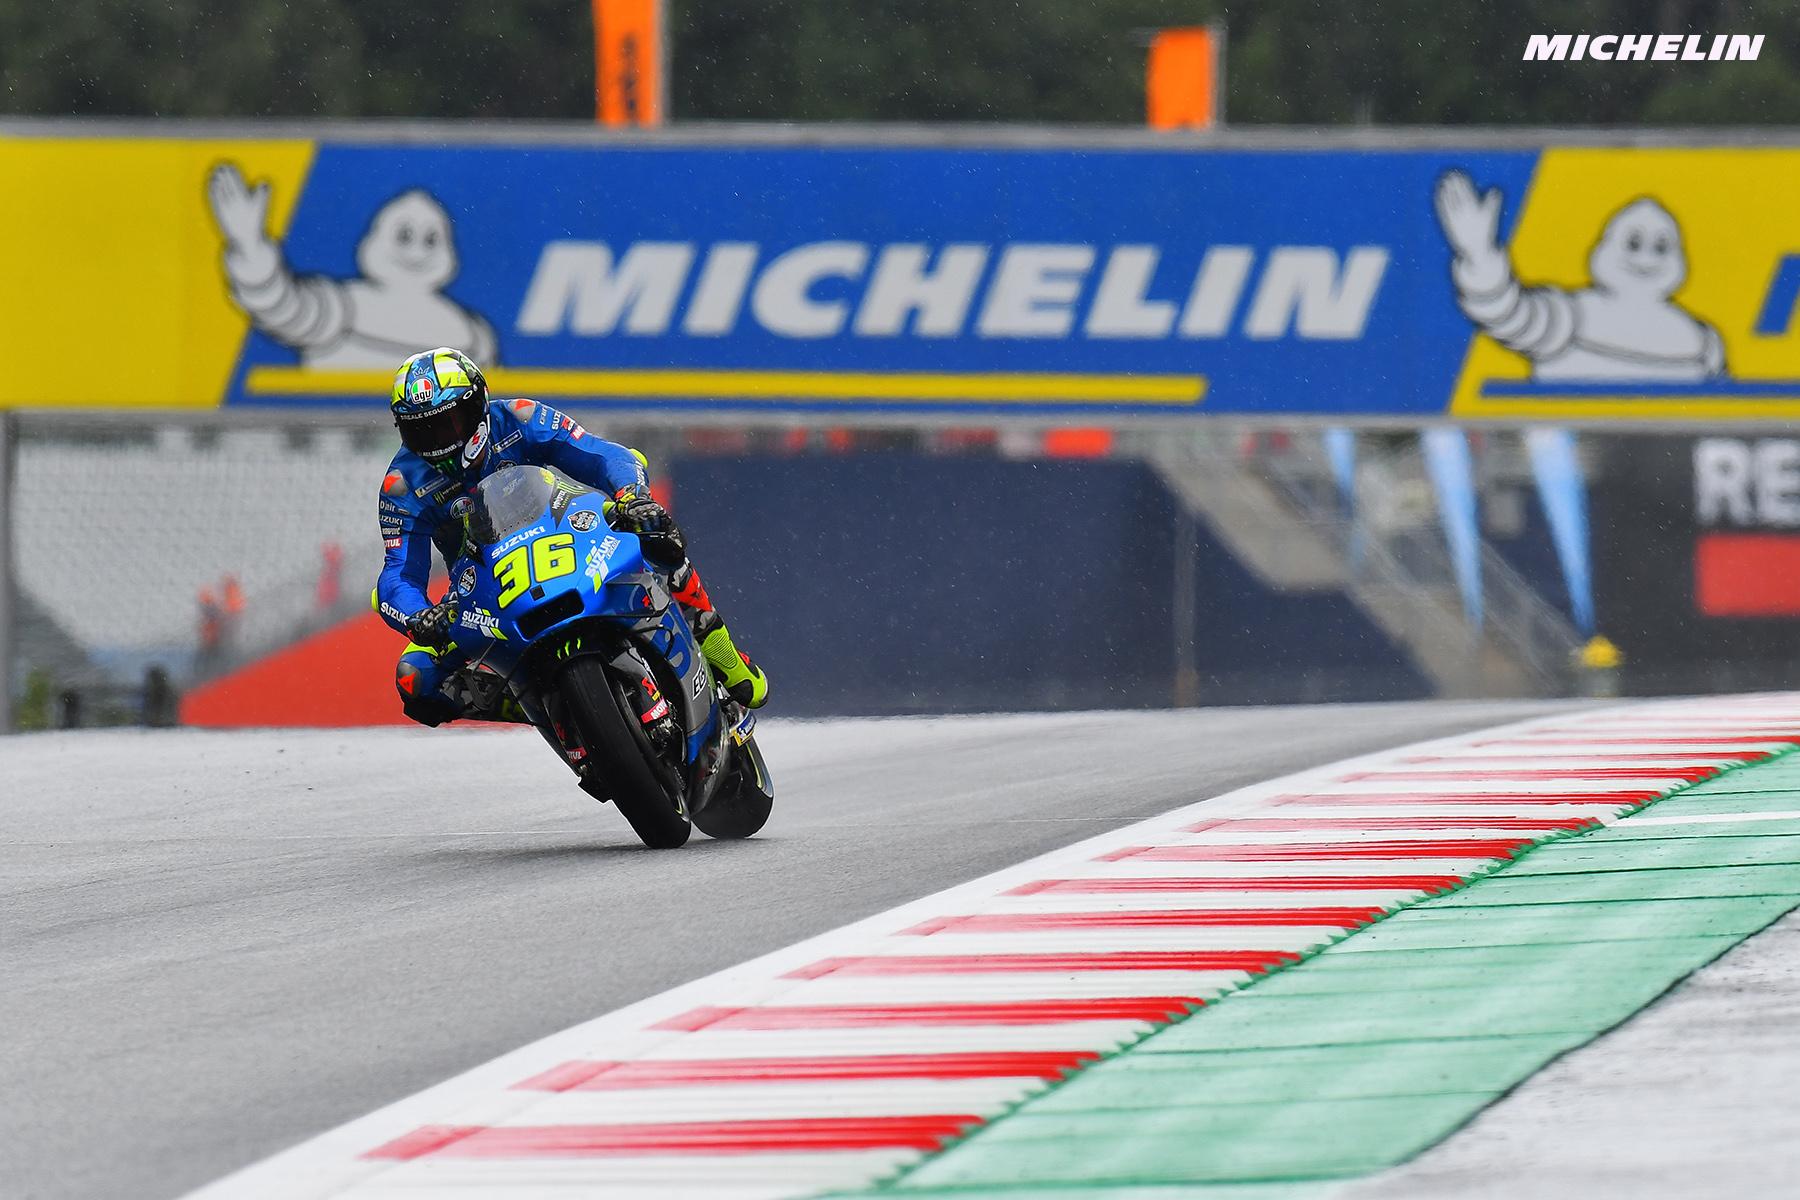 MotoGP2021 初日総合2位 ジョアン・ミル「ペースが良い事が重要」